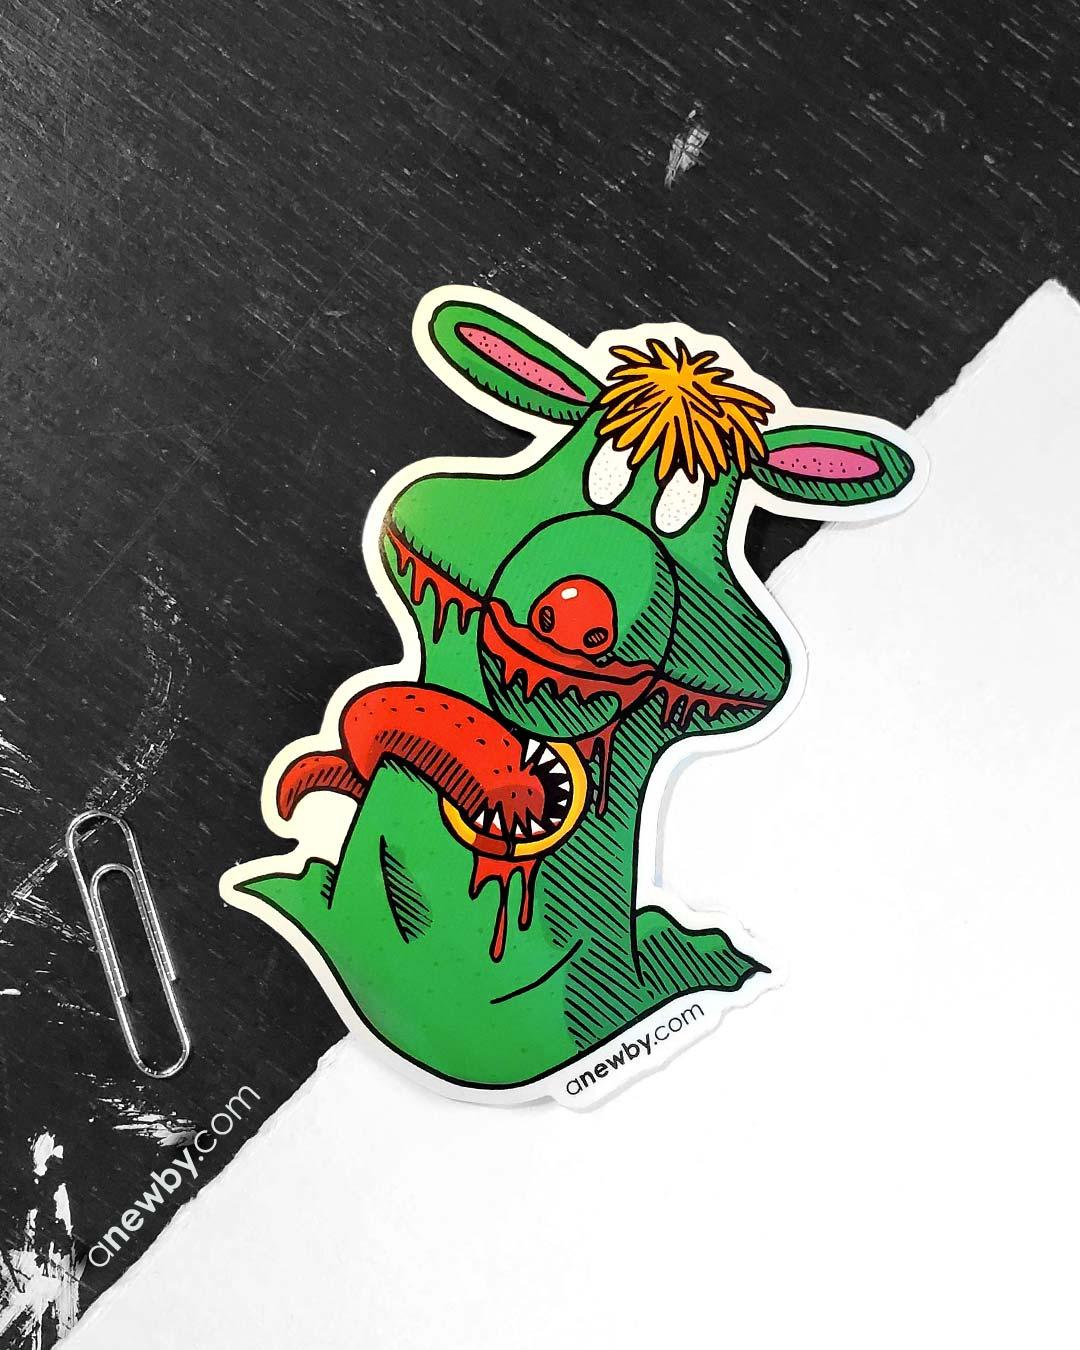 Parasite Sticker by Newby